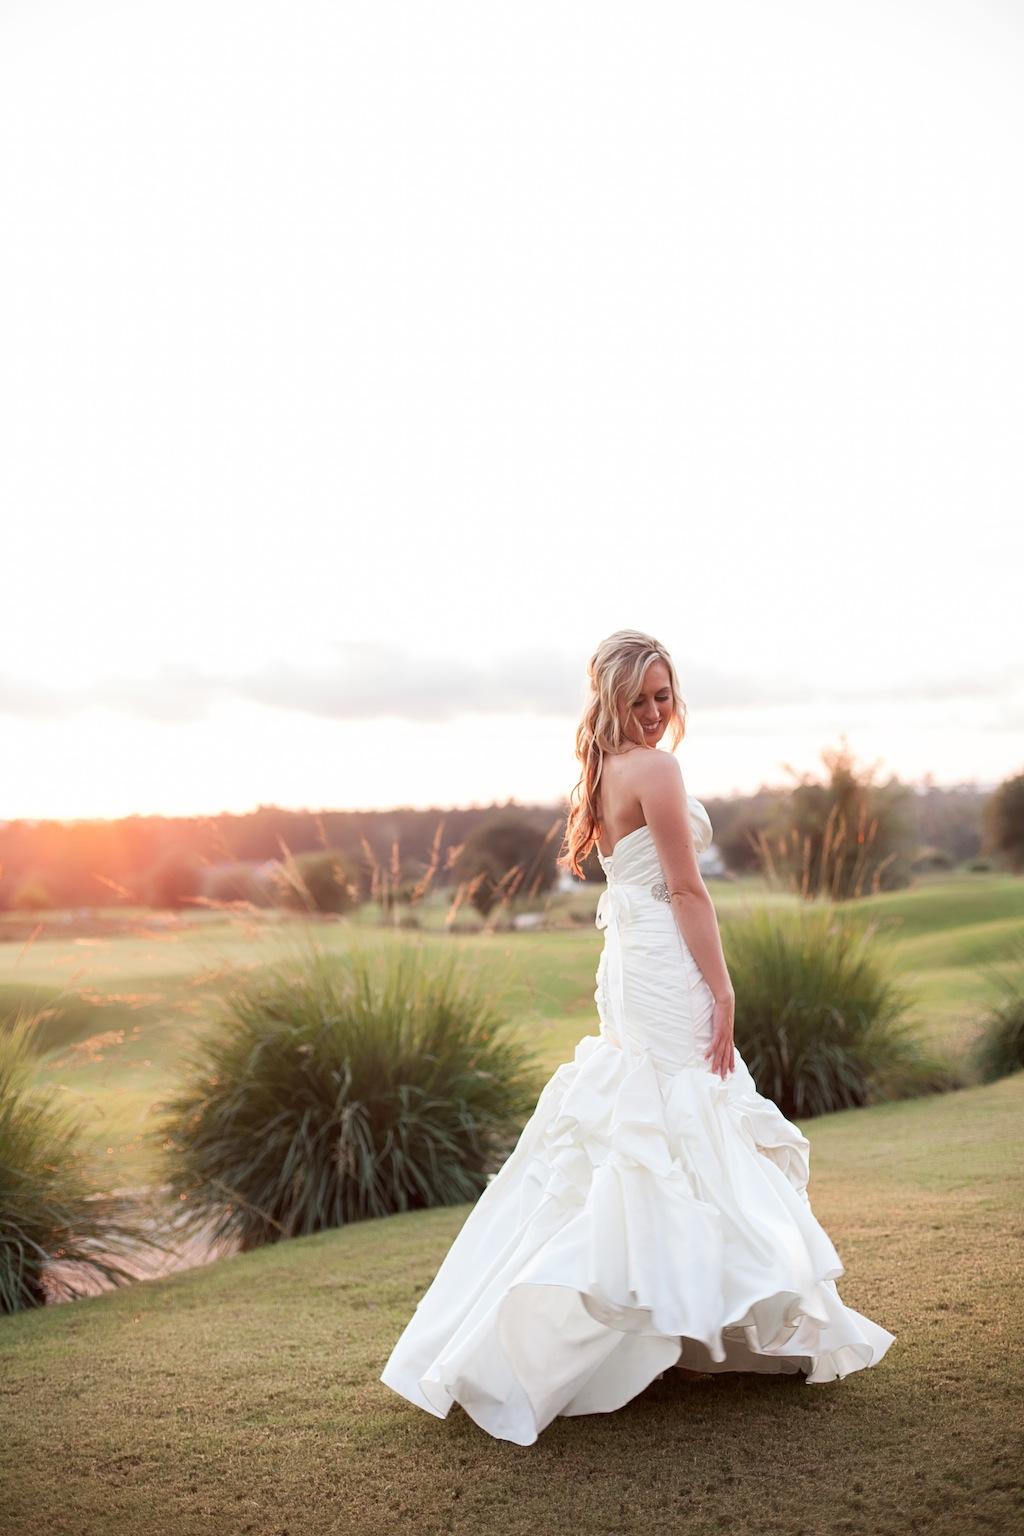 Brooksville Wedding - Purple, Silver & Ivory Wedding at Southern Hills Plantation Club - Brooksville Wedding Photographer Blue Lane Studios (46)